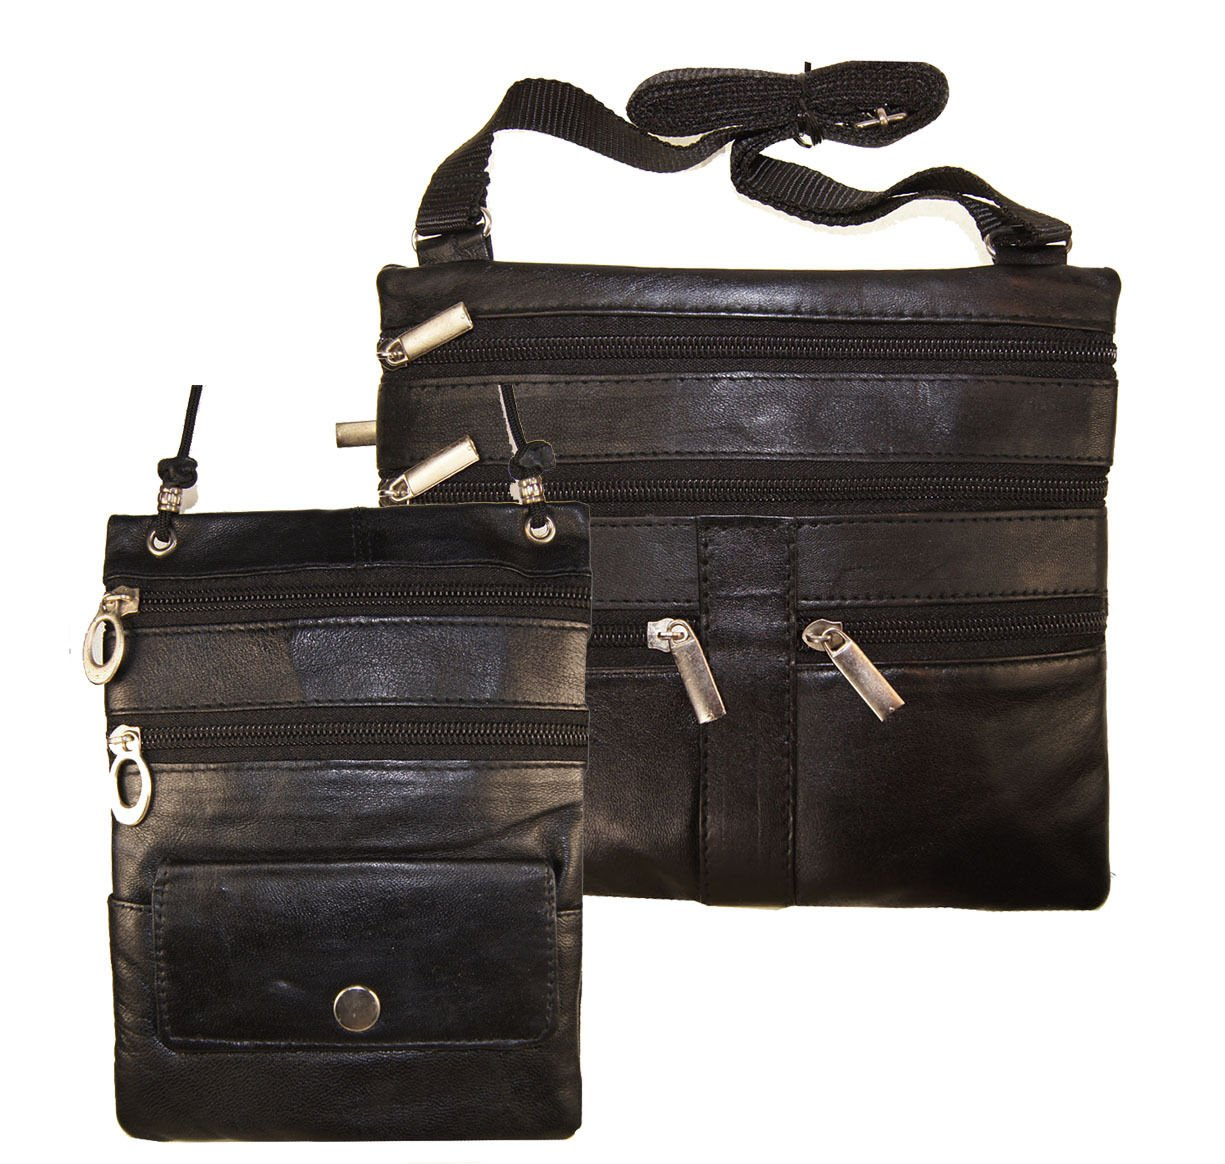 1 Lady 2 Black Cross Body Leather Satchel Messenger Bag 48'' Strap